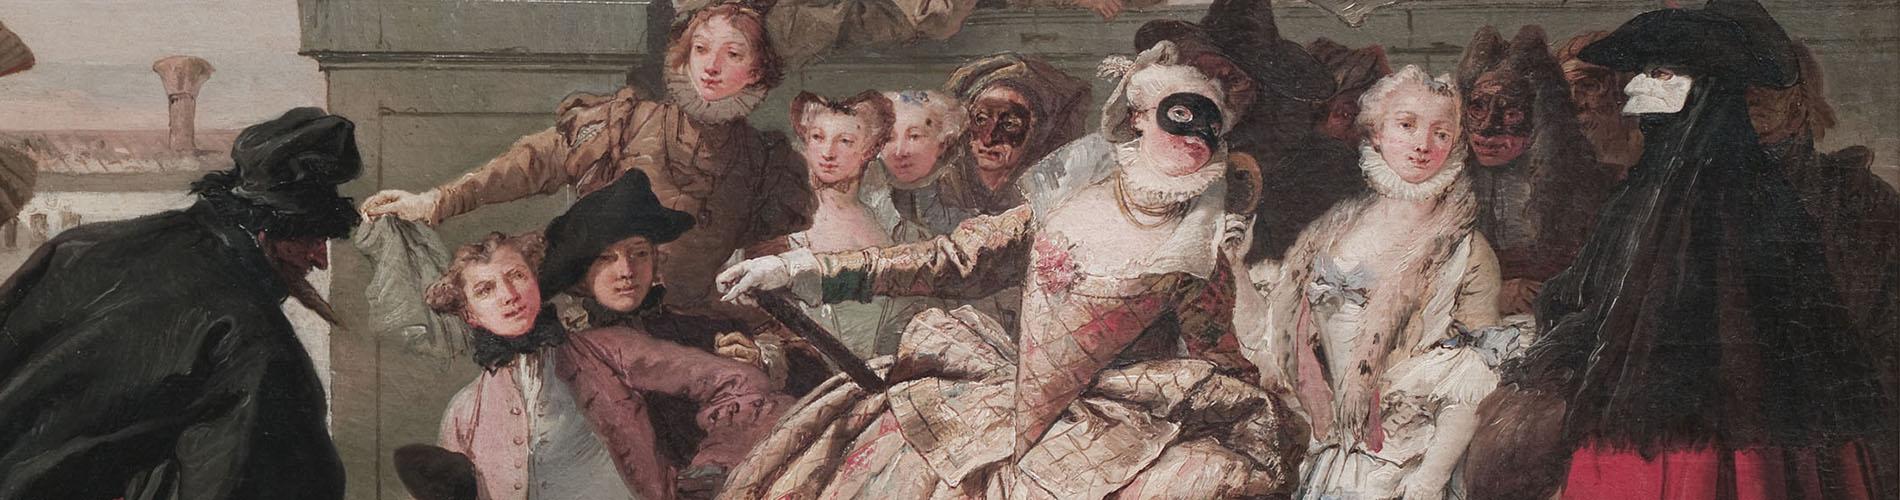 Giandomenico Tiepolo, The Minuet, 1756